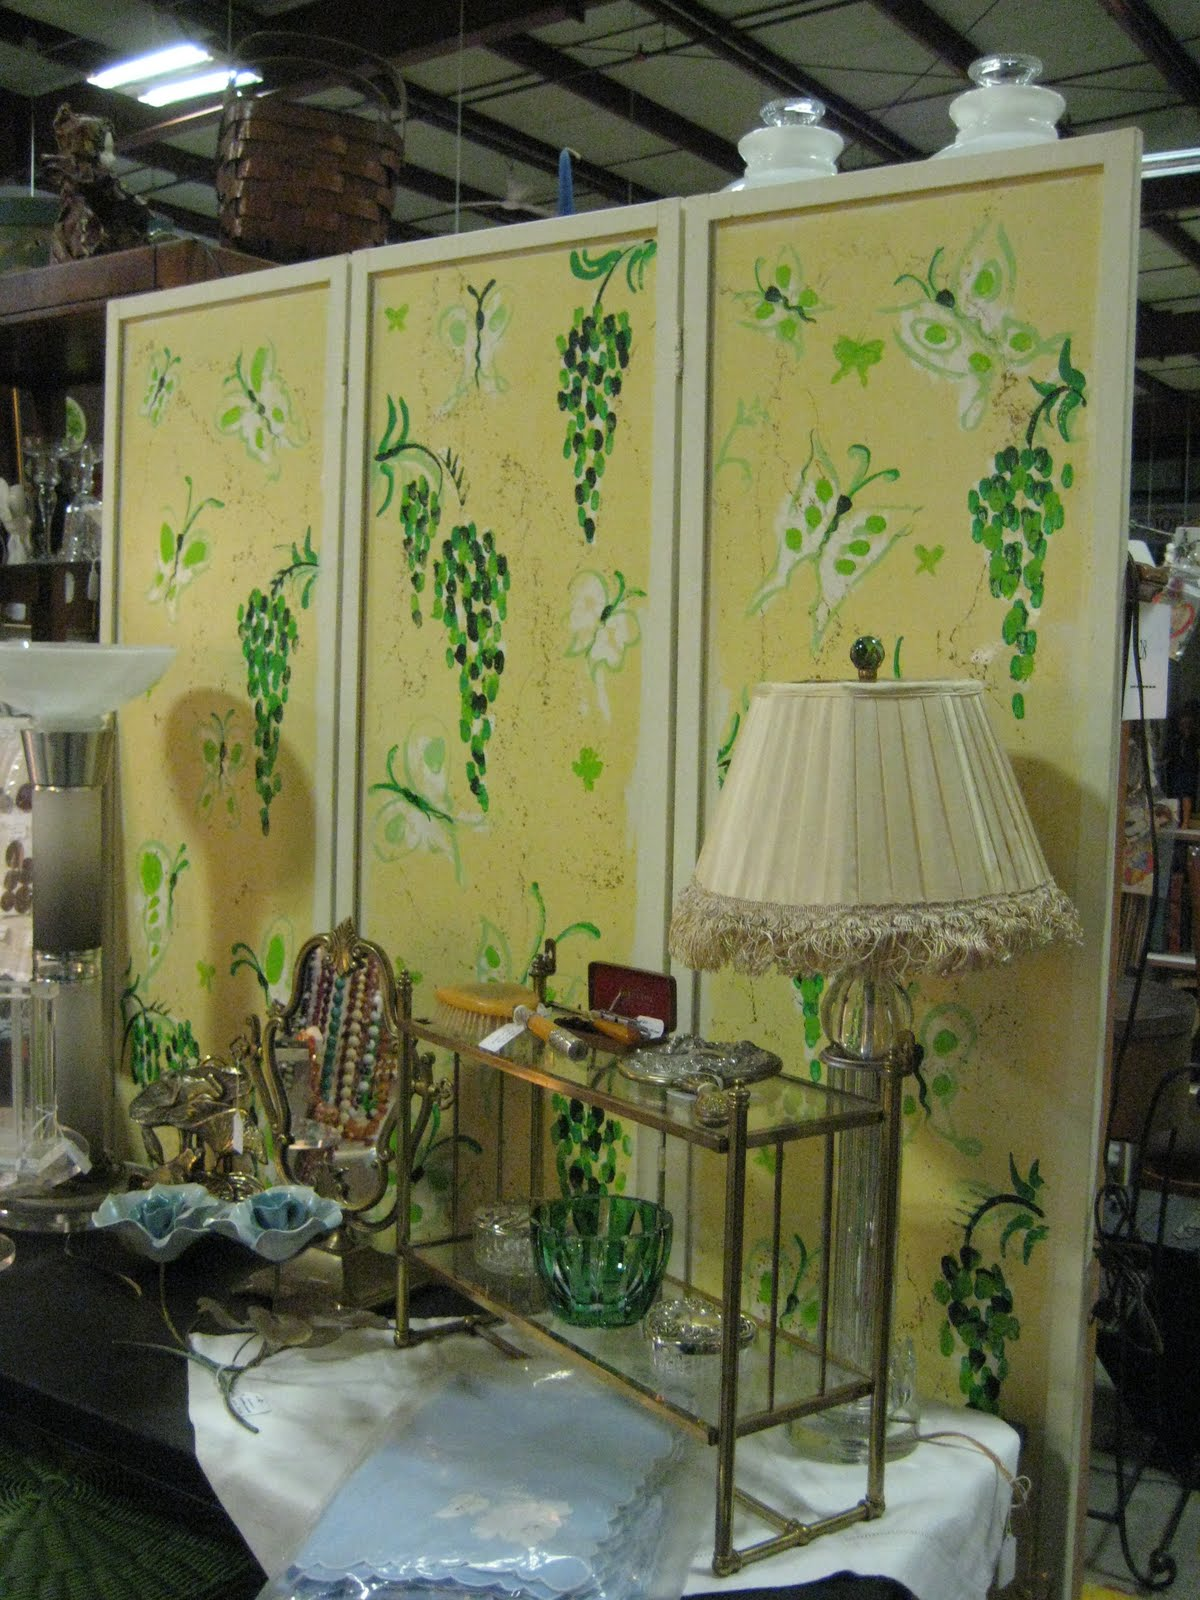 Kitsch 'n Stuff: Using A Room Screen As